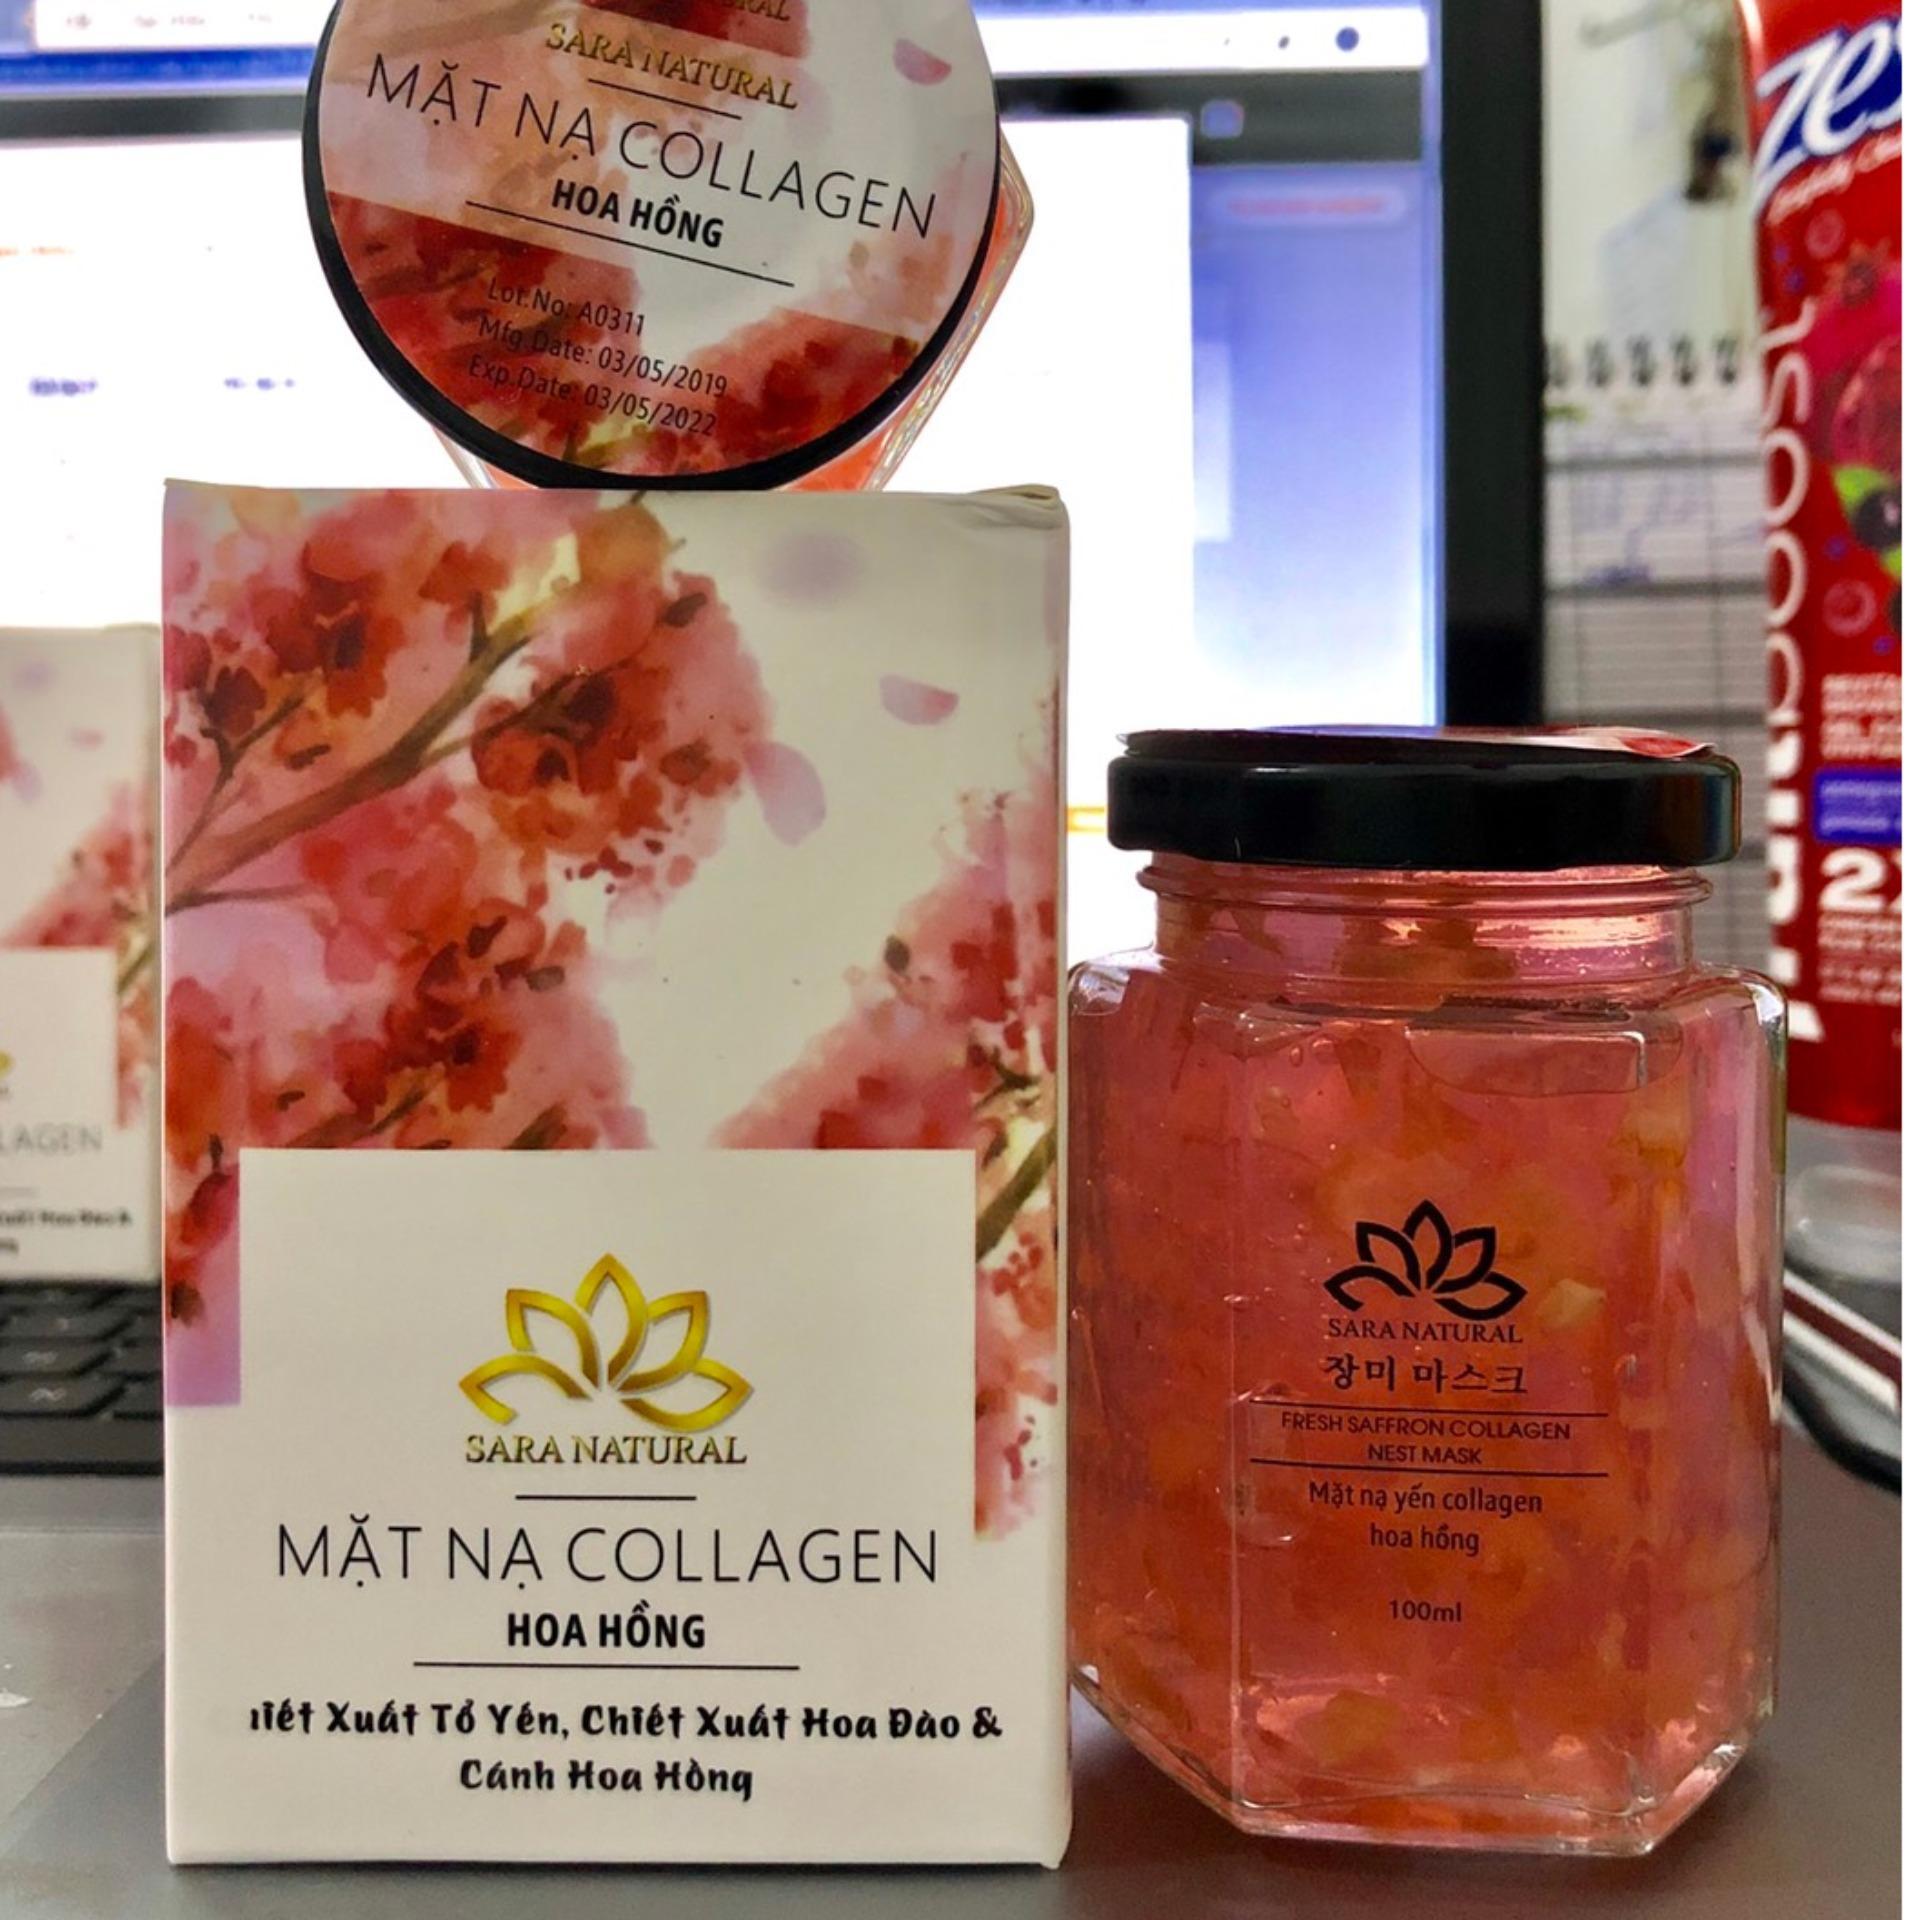 Mặt Nạ Ngủ Collagen 100ml - Hoa Hồng